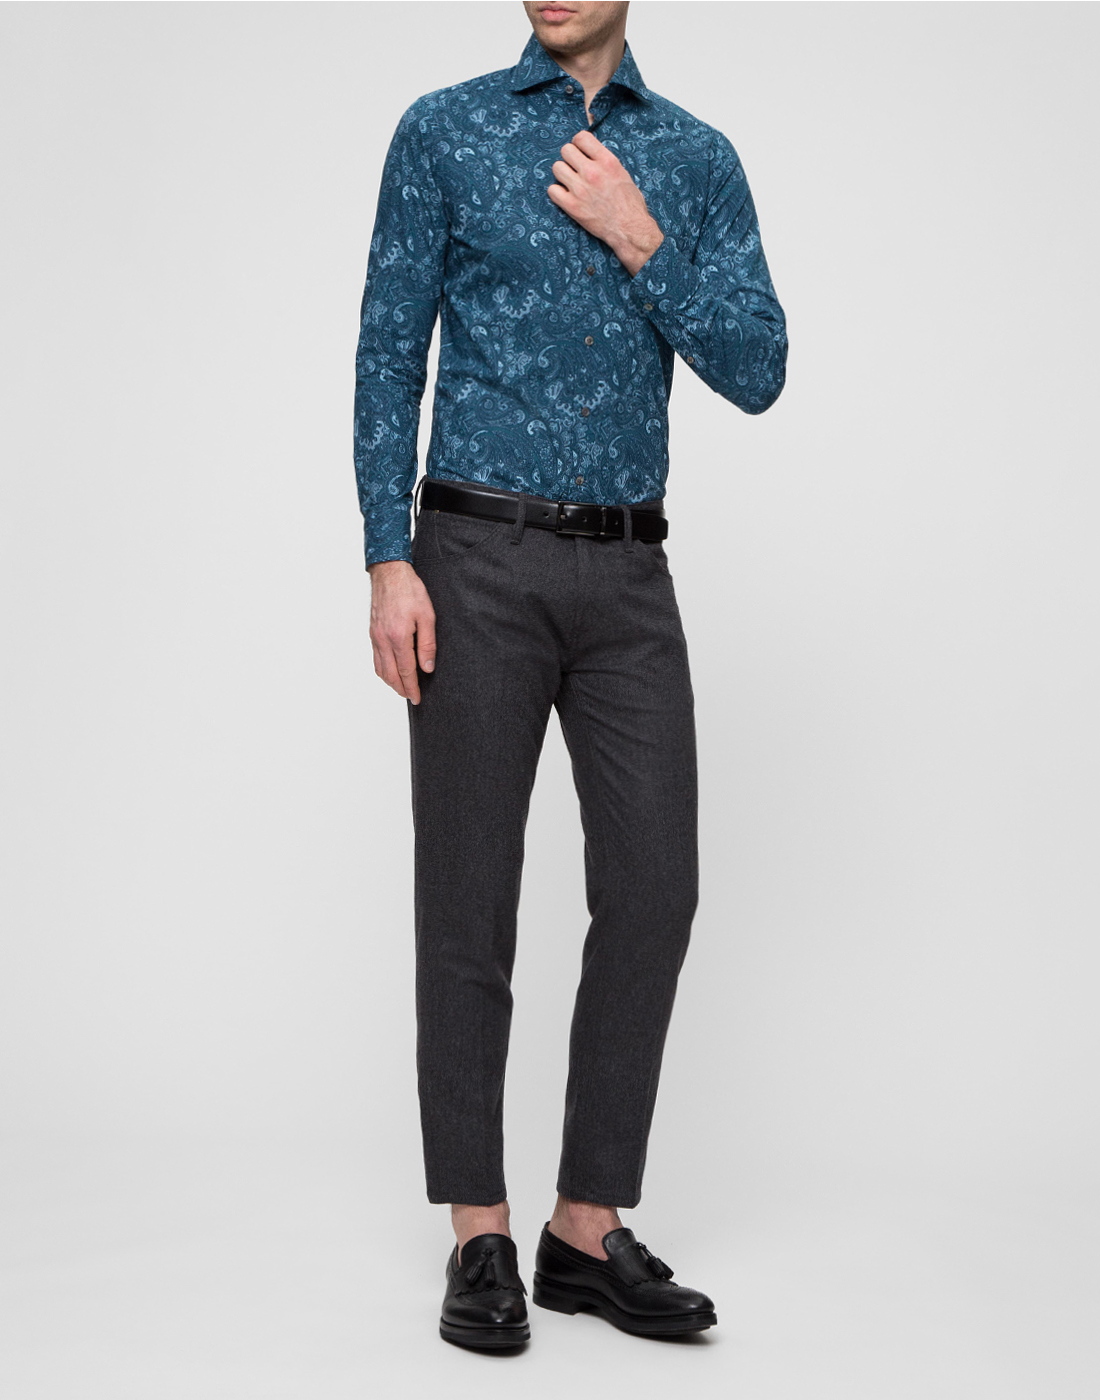 Мужская рубашка бирюзового цвета Bagutta S09715.650-5